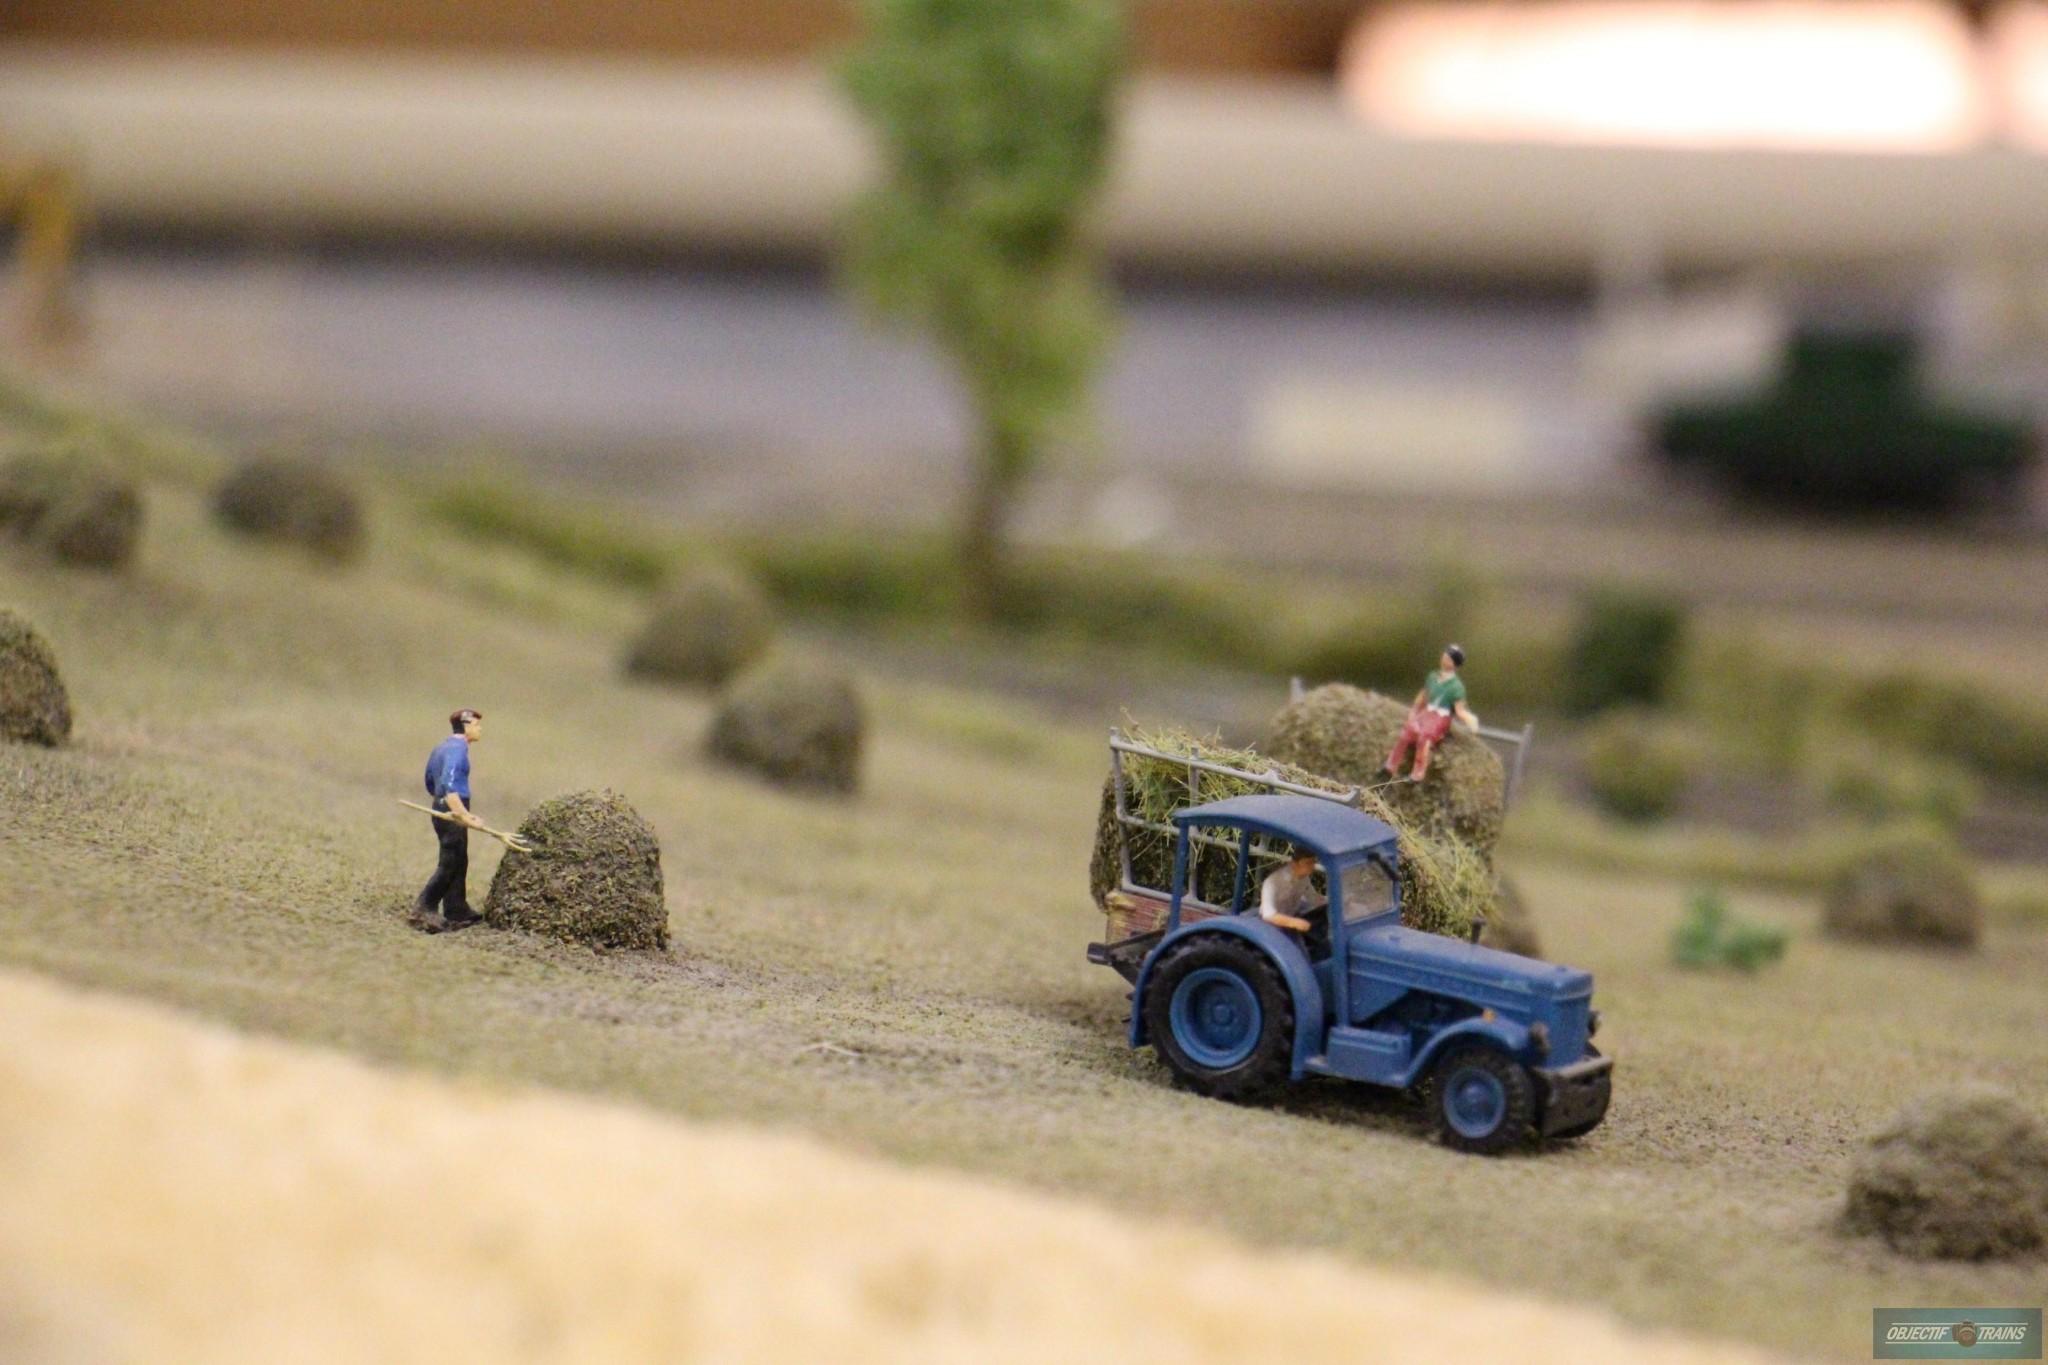 reseau-rail miniature castrais-castres-reseau-Ho (33)